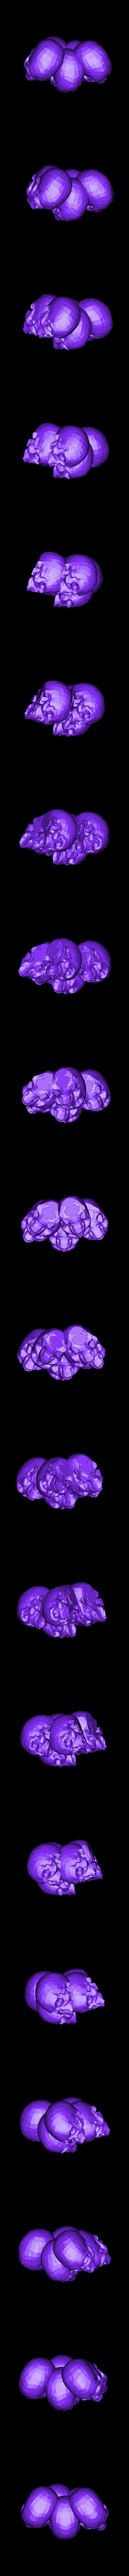 Chair_Skulls.stl Download free 3MF file One-Armed Dino-Jesus & His Pet Tyrannosaur • 3D printing model, EmanG